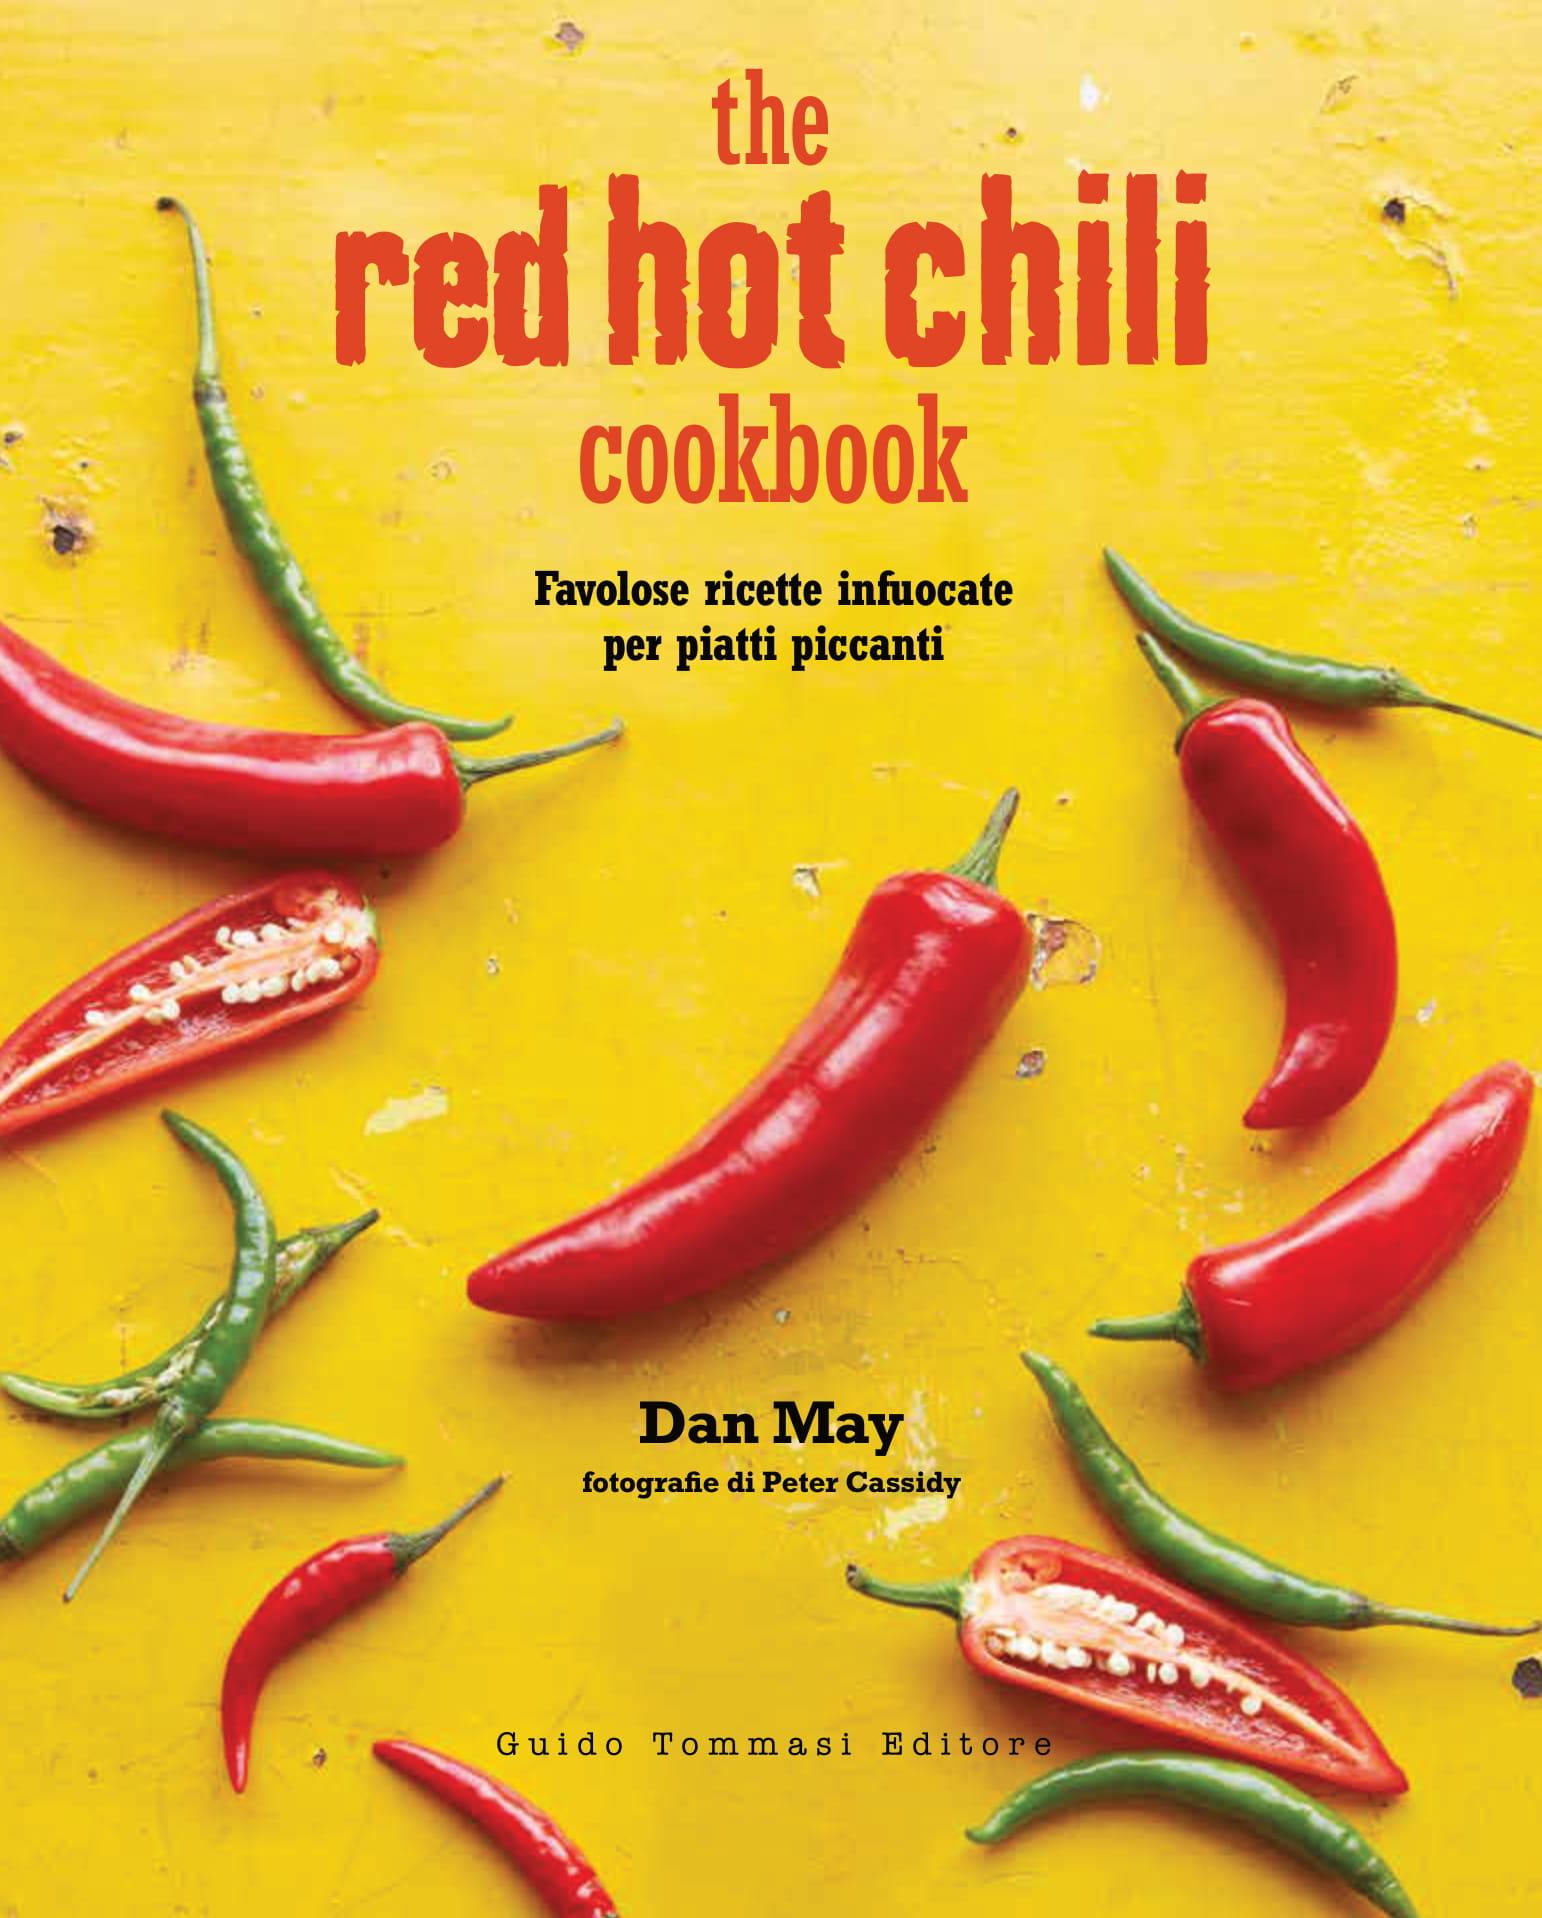 redhotchilicookbook cover peperoncino piccante